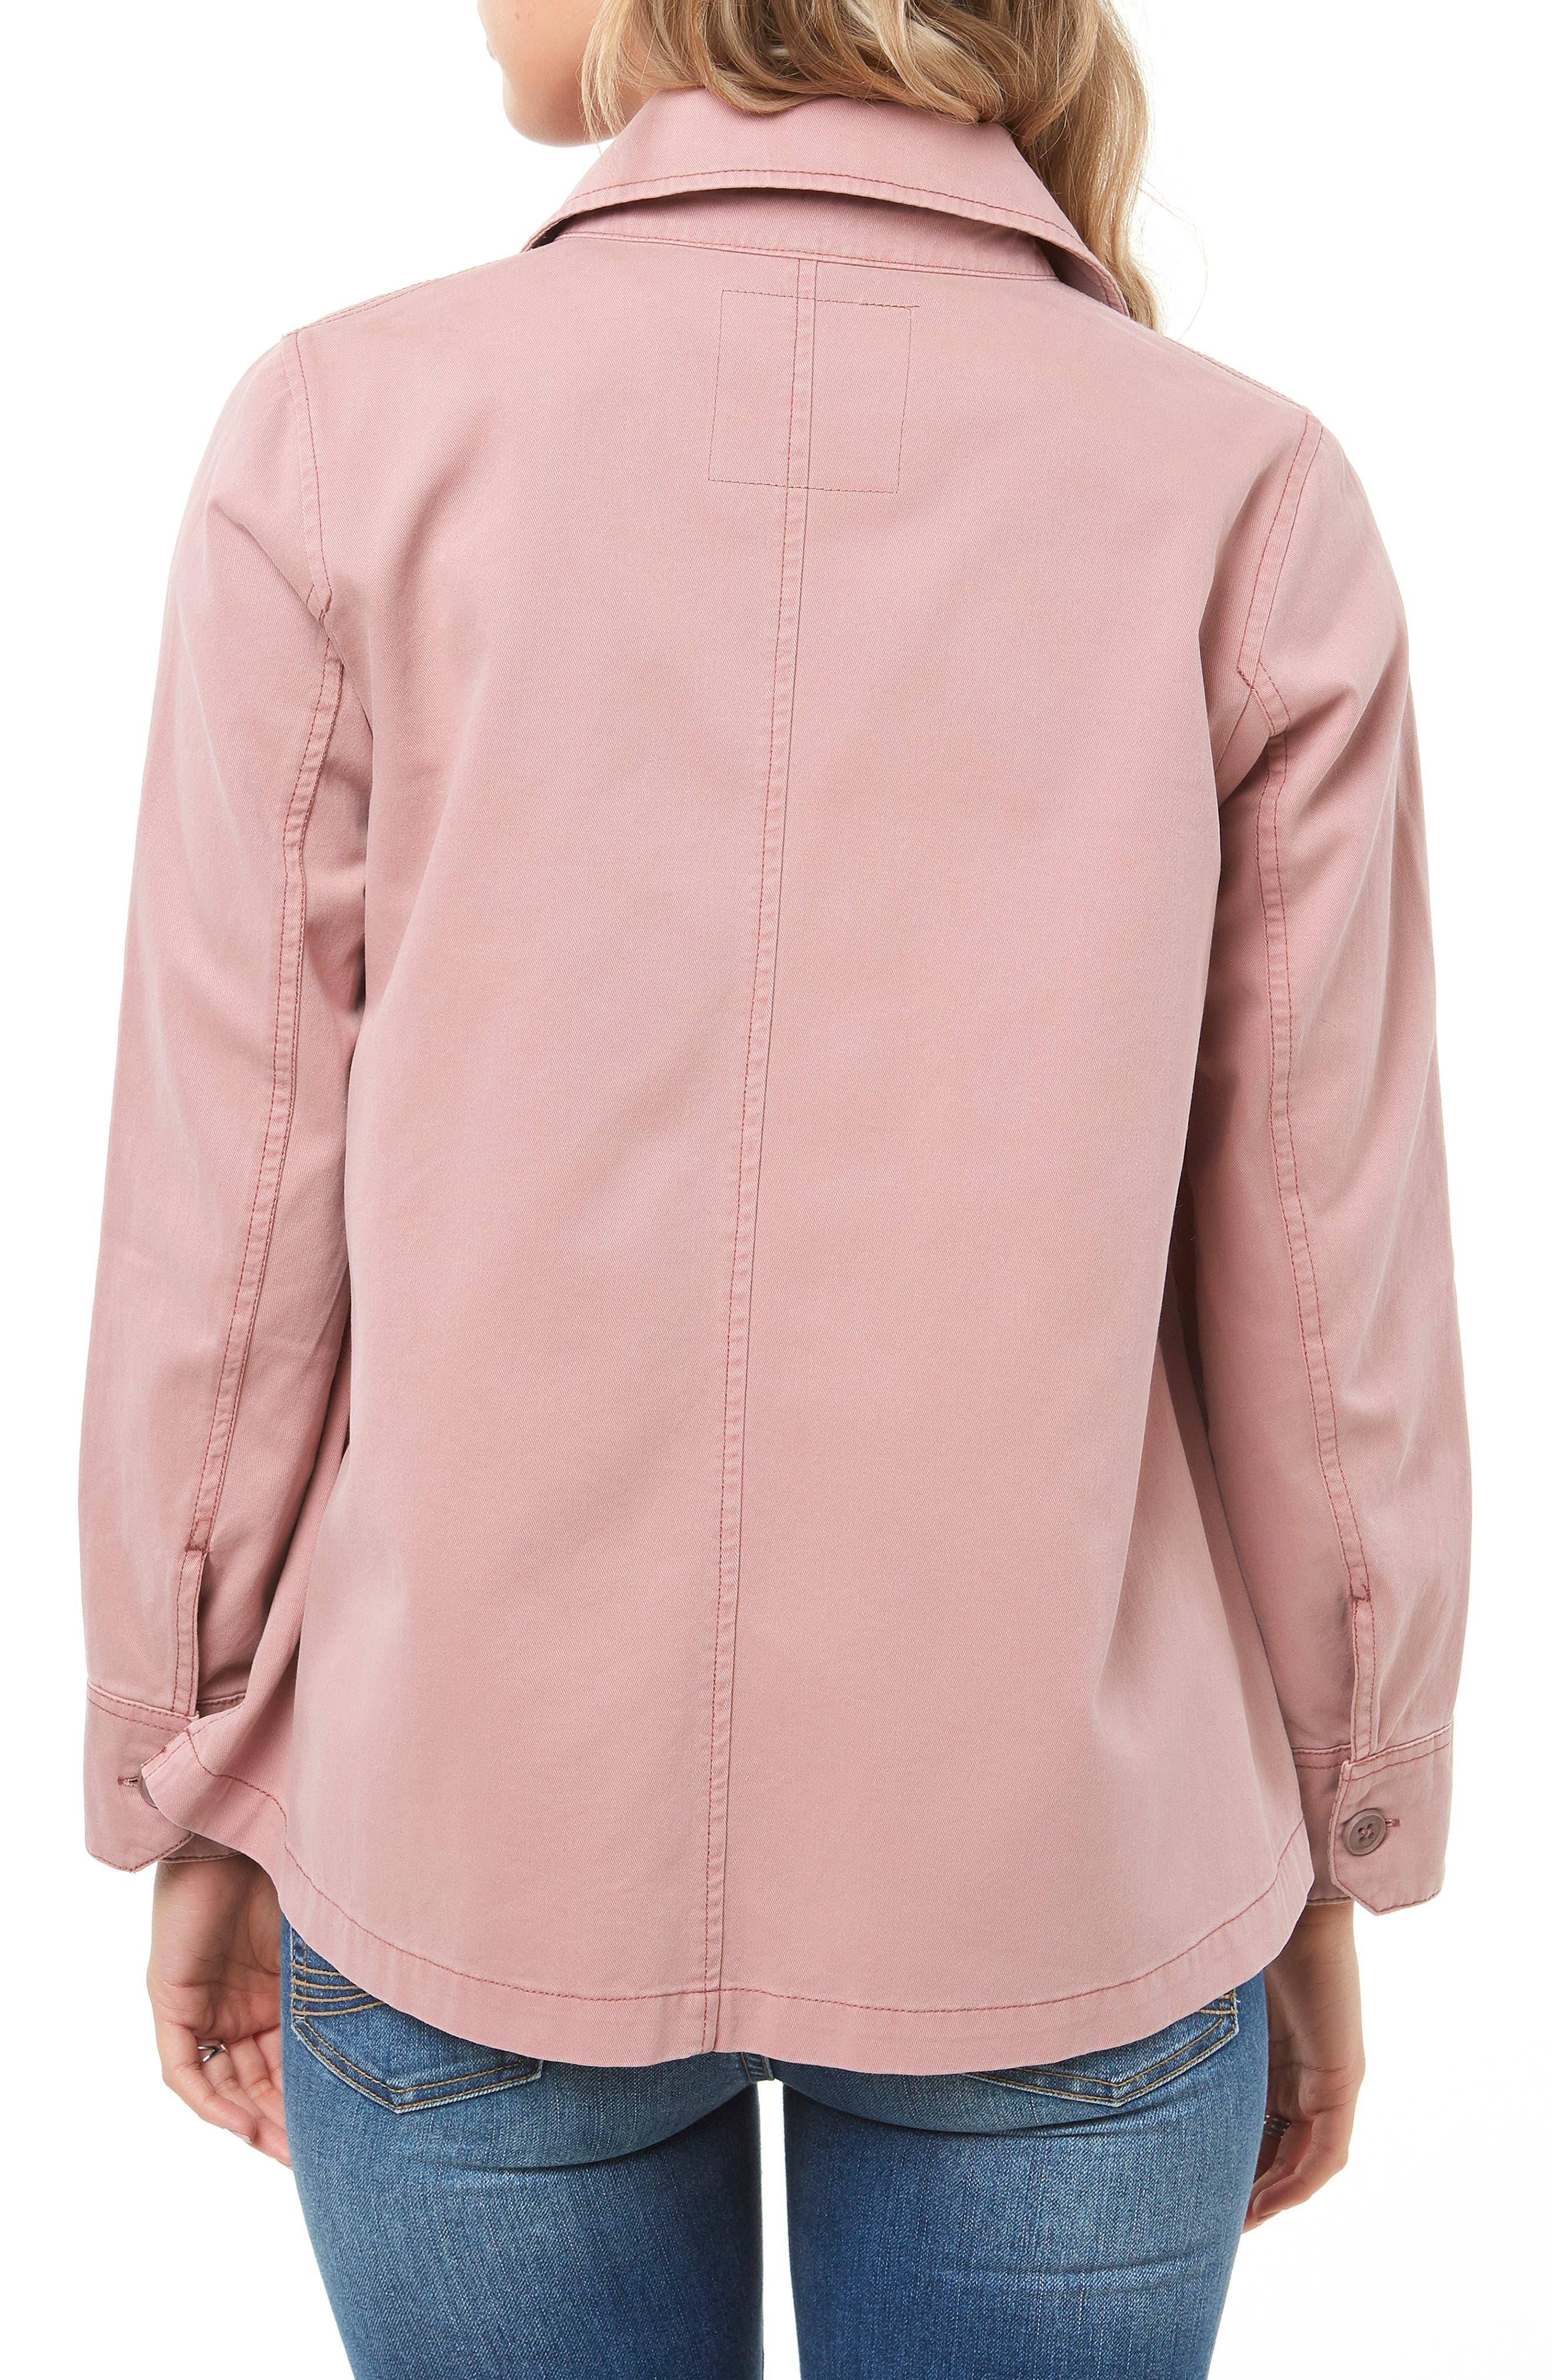 Ripley Twill Shirt Jacket,                             Alternate thumbnail 2, color,                             FAWN